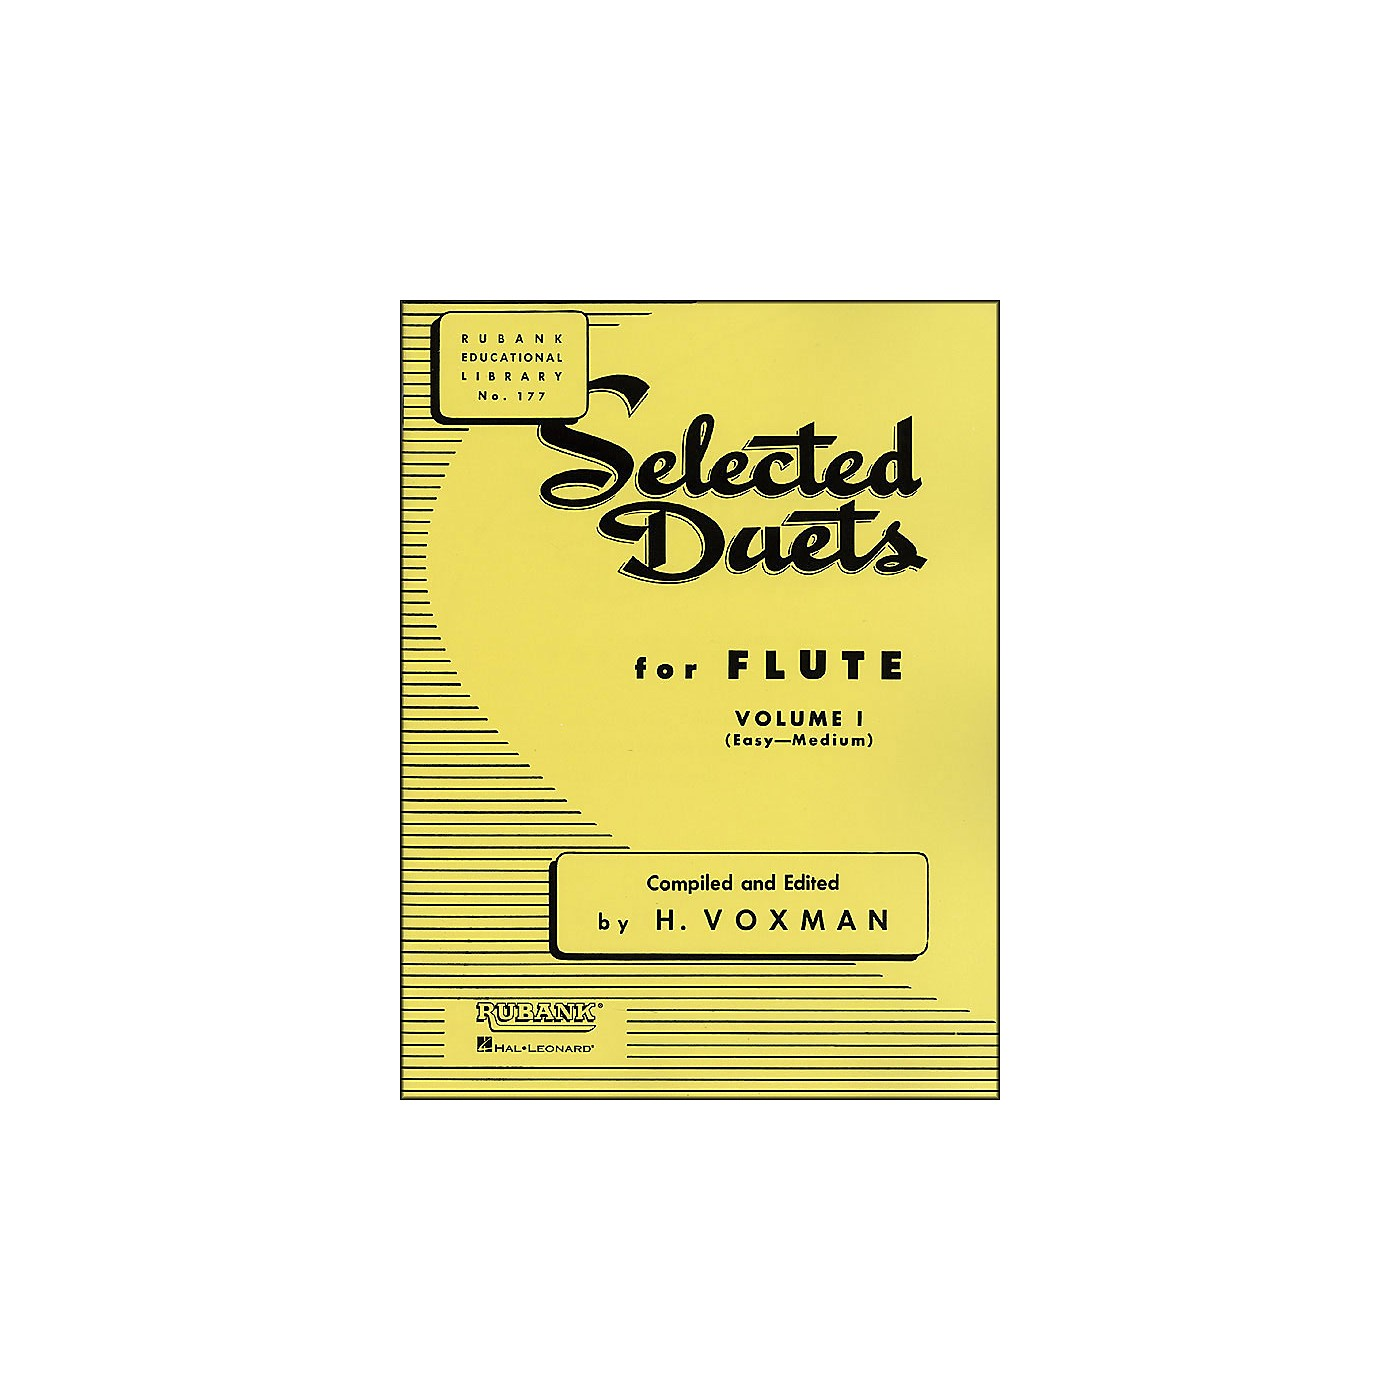 Hal Leonard Rubank Selected Duets for Flute, Vol. 1: Easy–Medium thumbnail